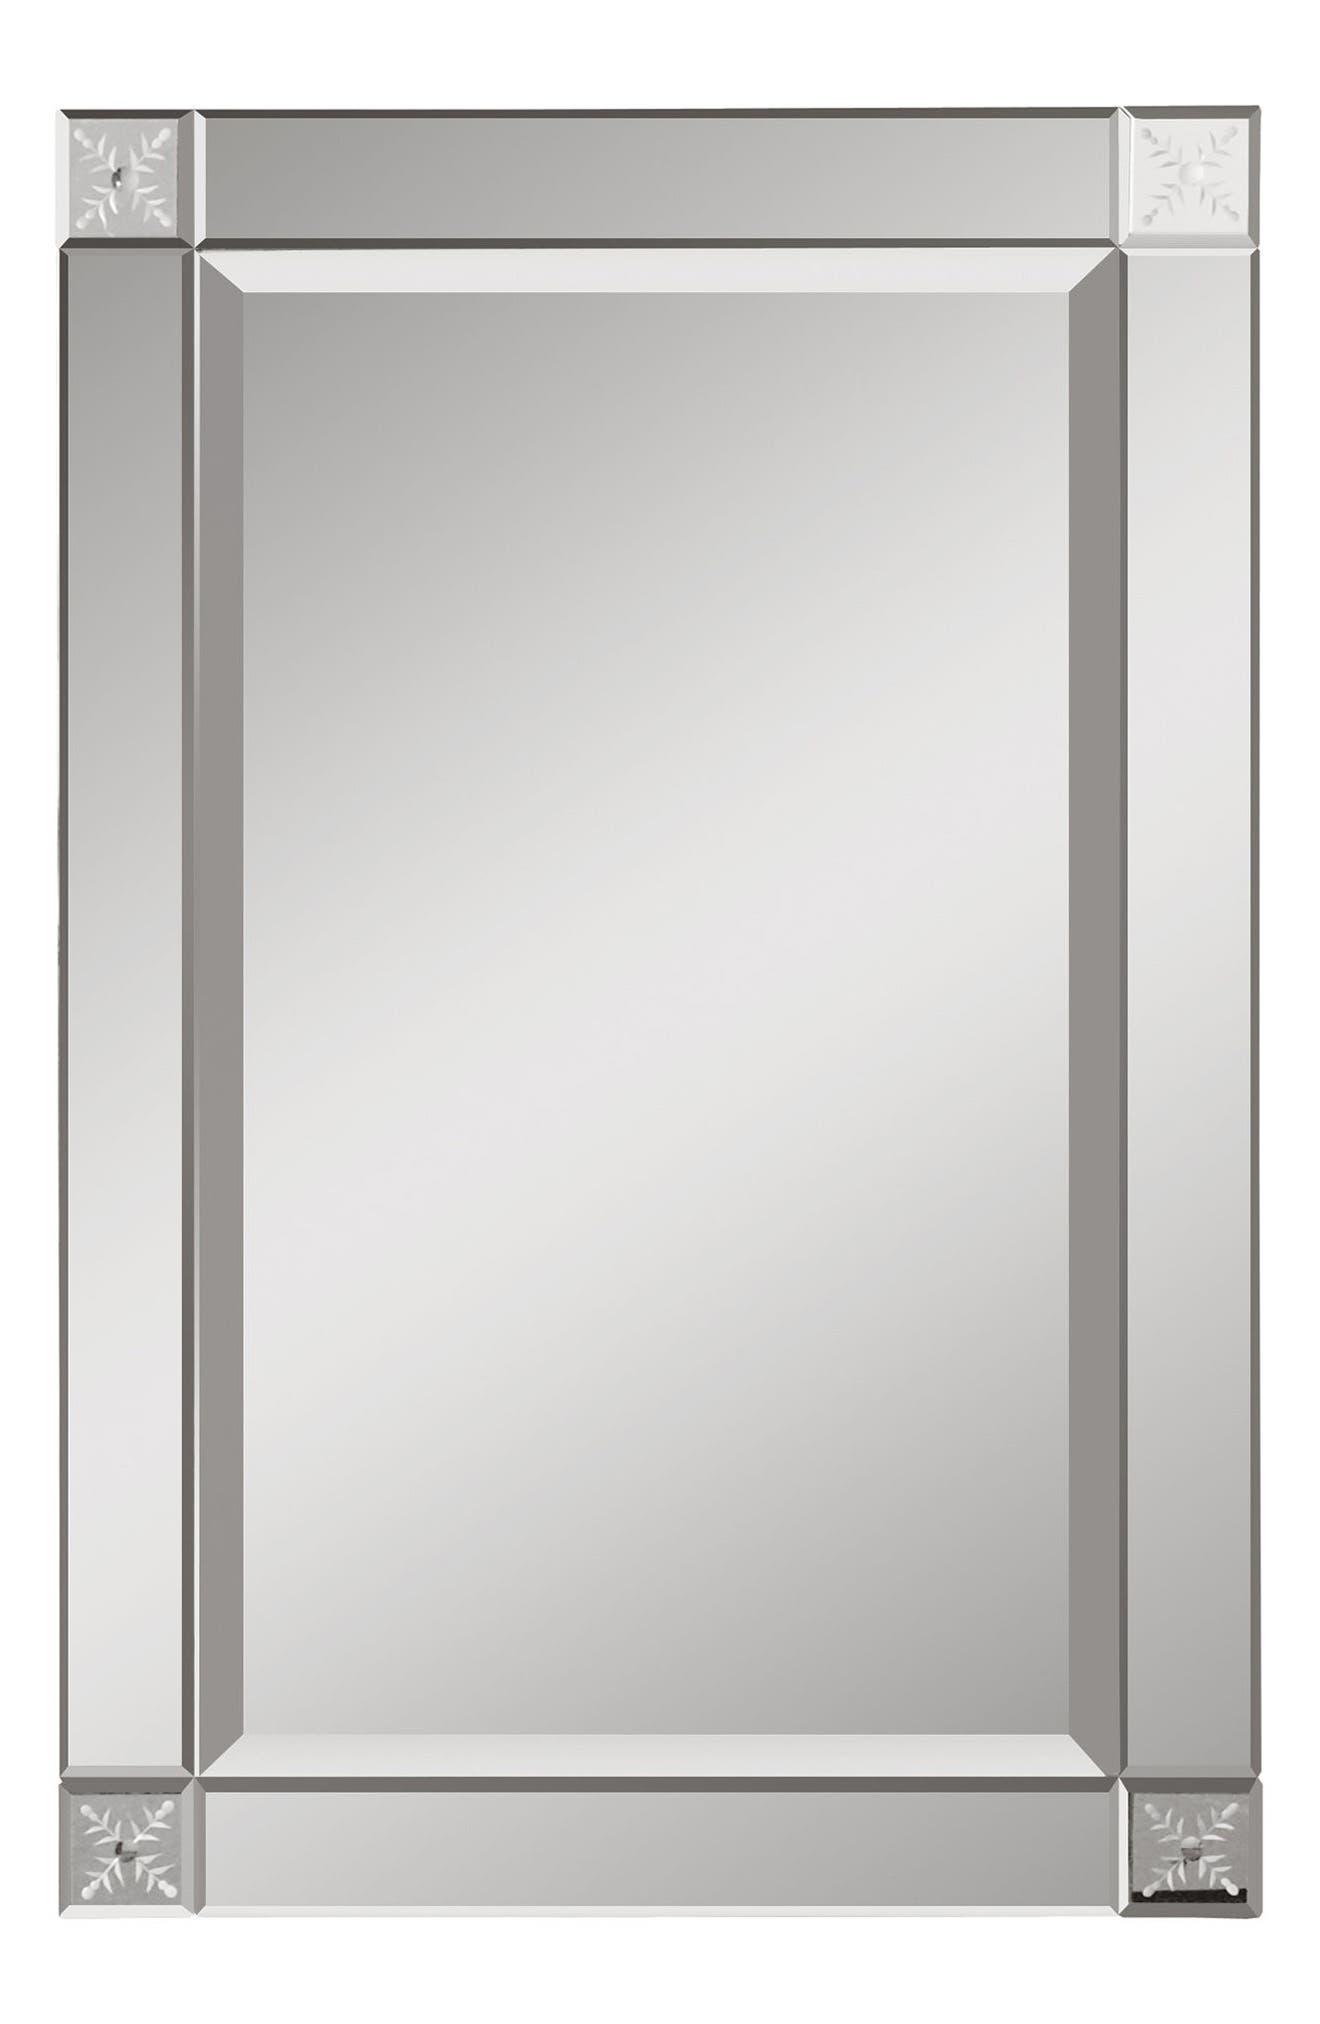 Emberlynn Frameless Wall Mirror,                             Main thumbnail 1, color,                             040